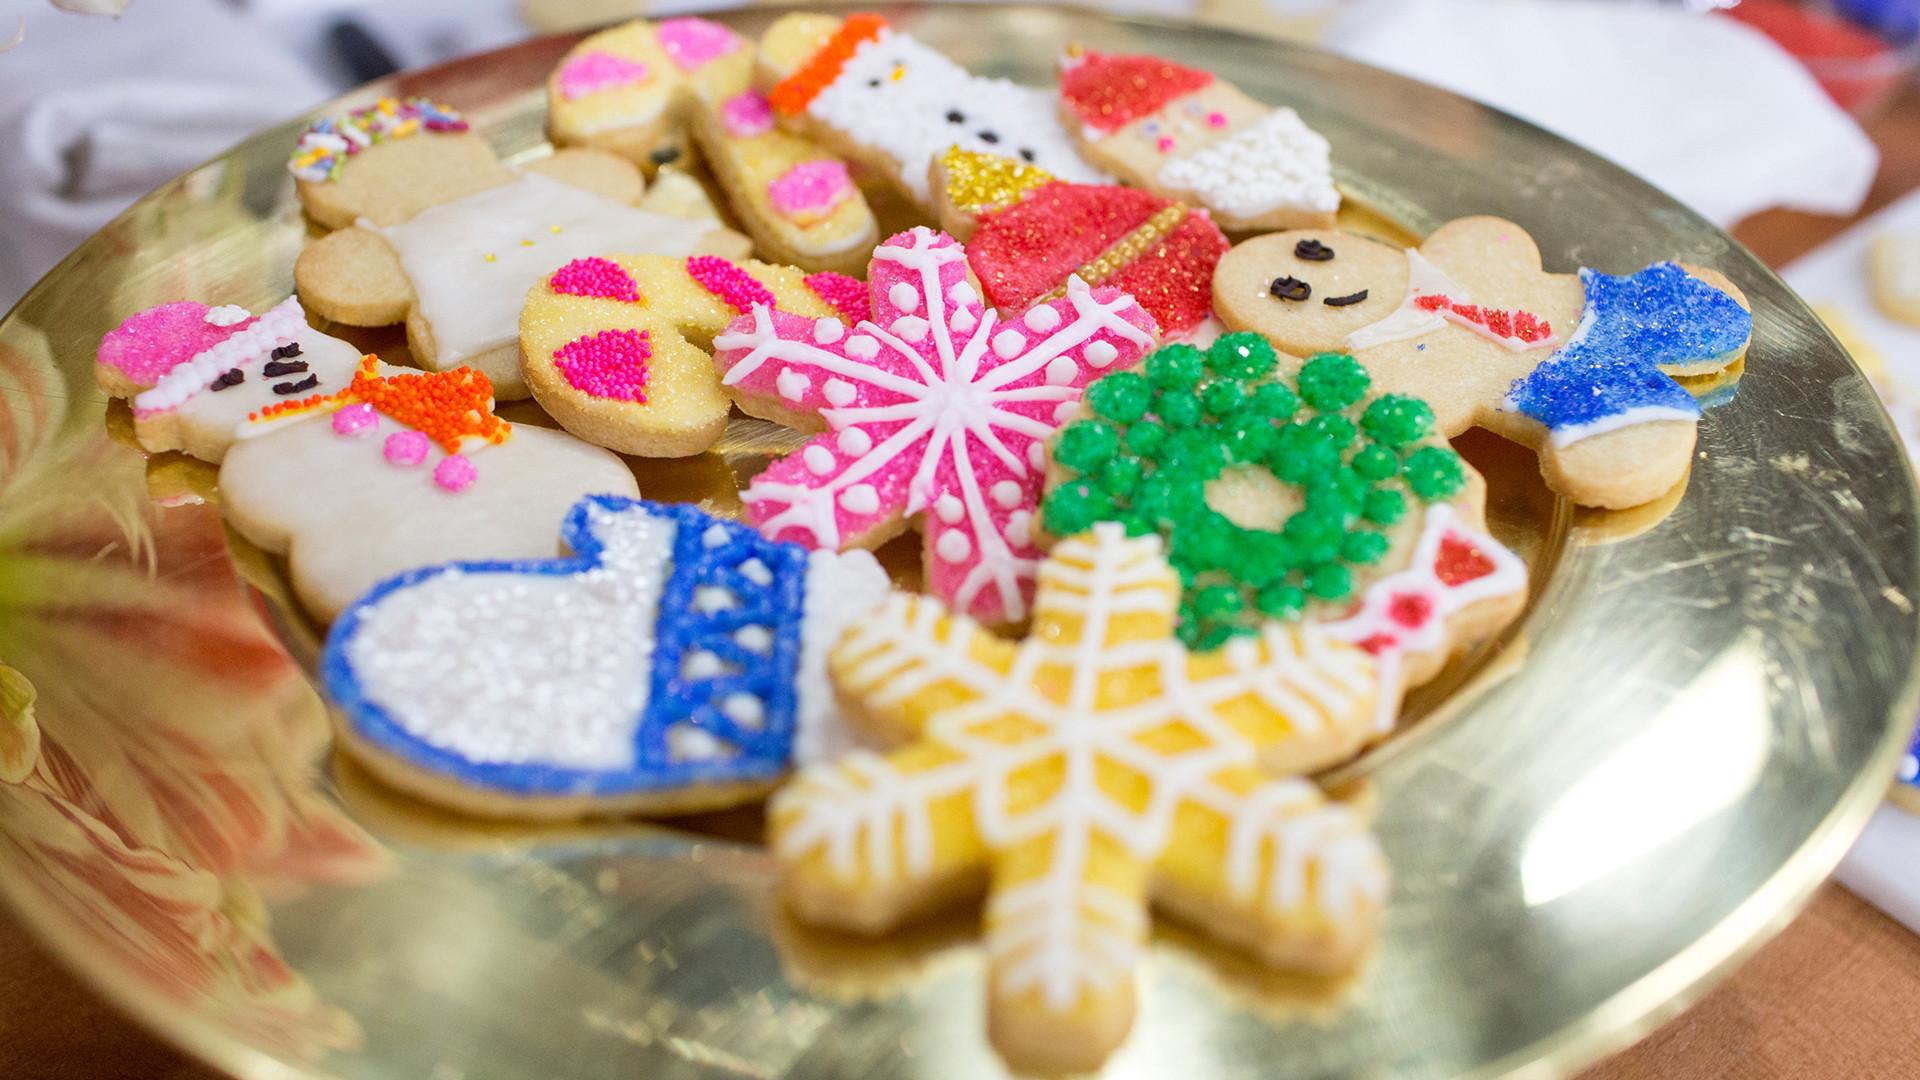 Christmas Cutout Cookies  Christina Tosi s 4 Ingre nt Cutout Cookies TODAY